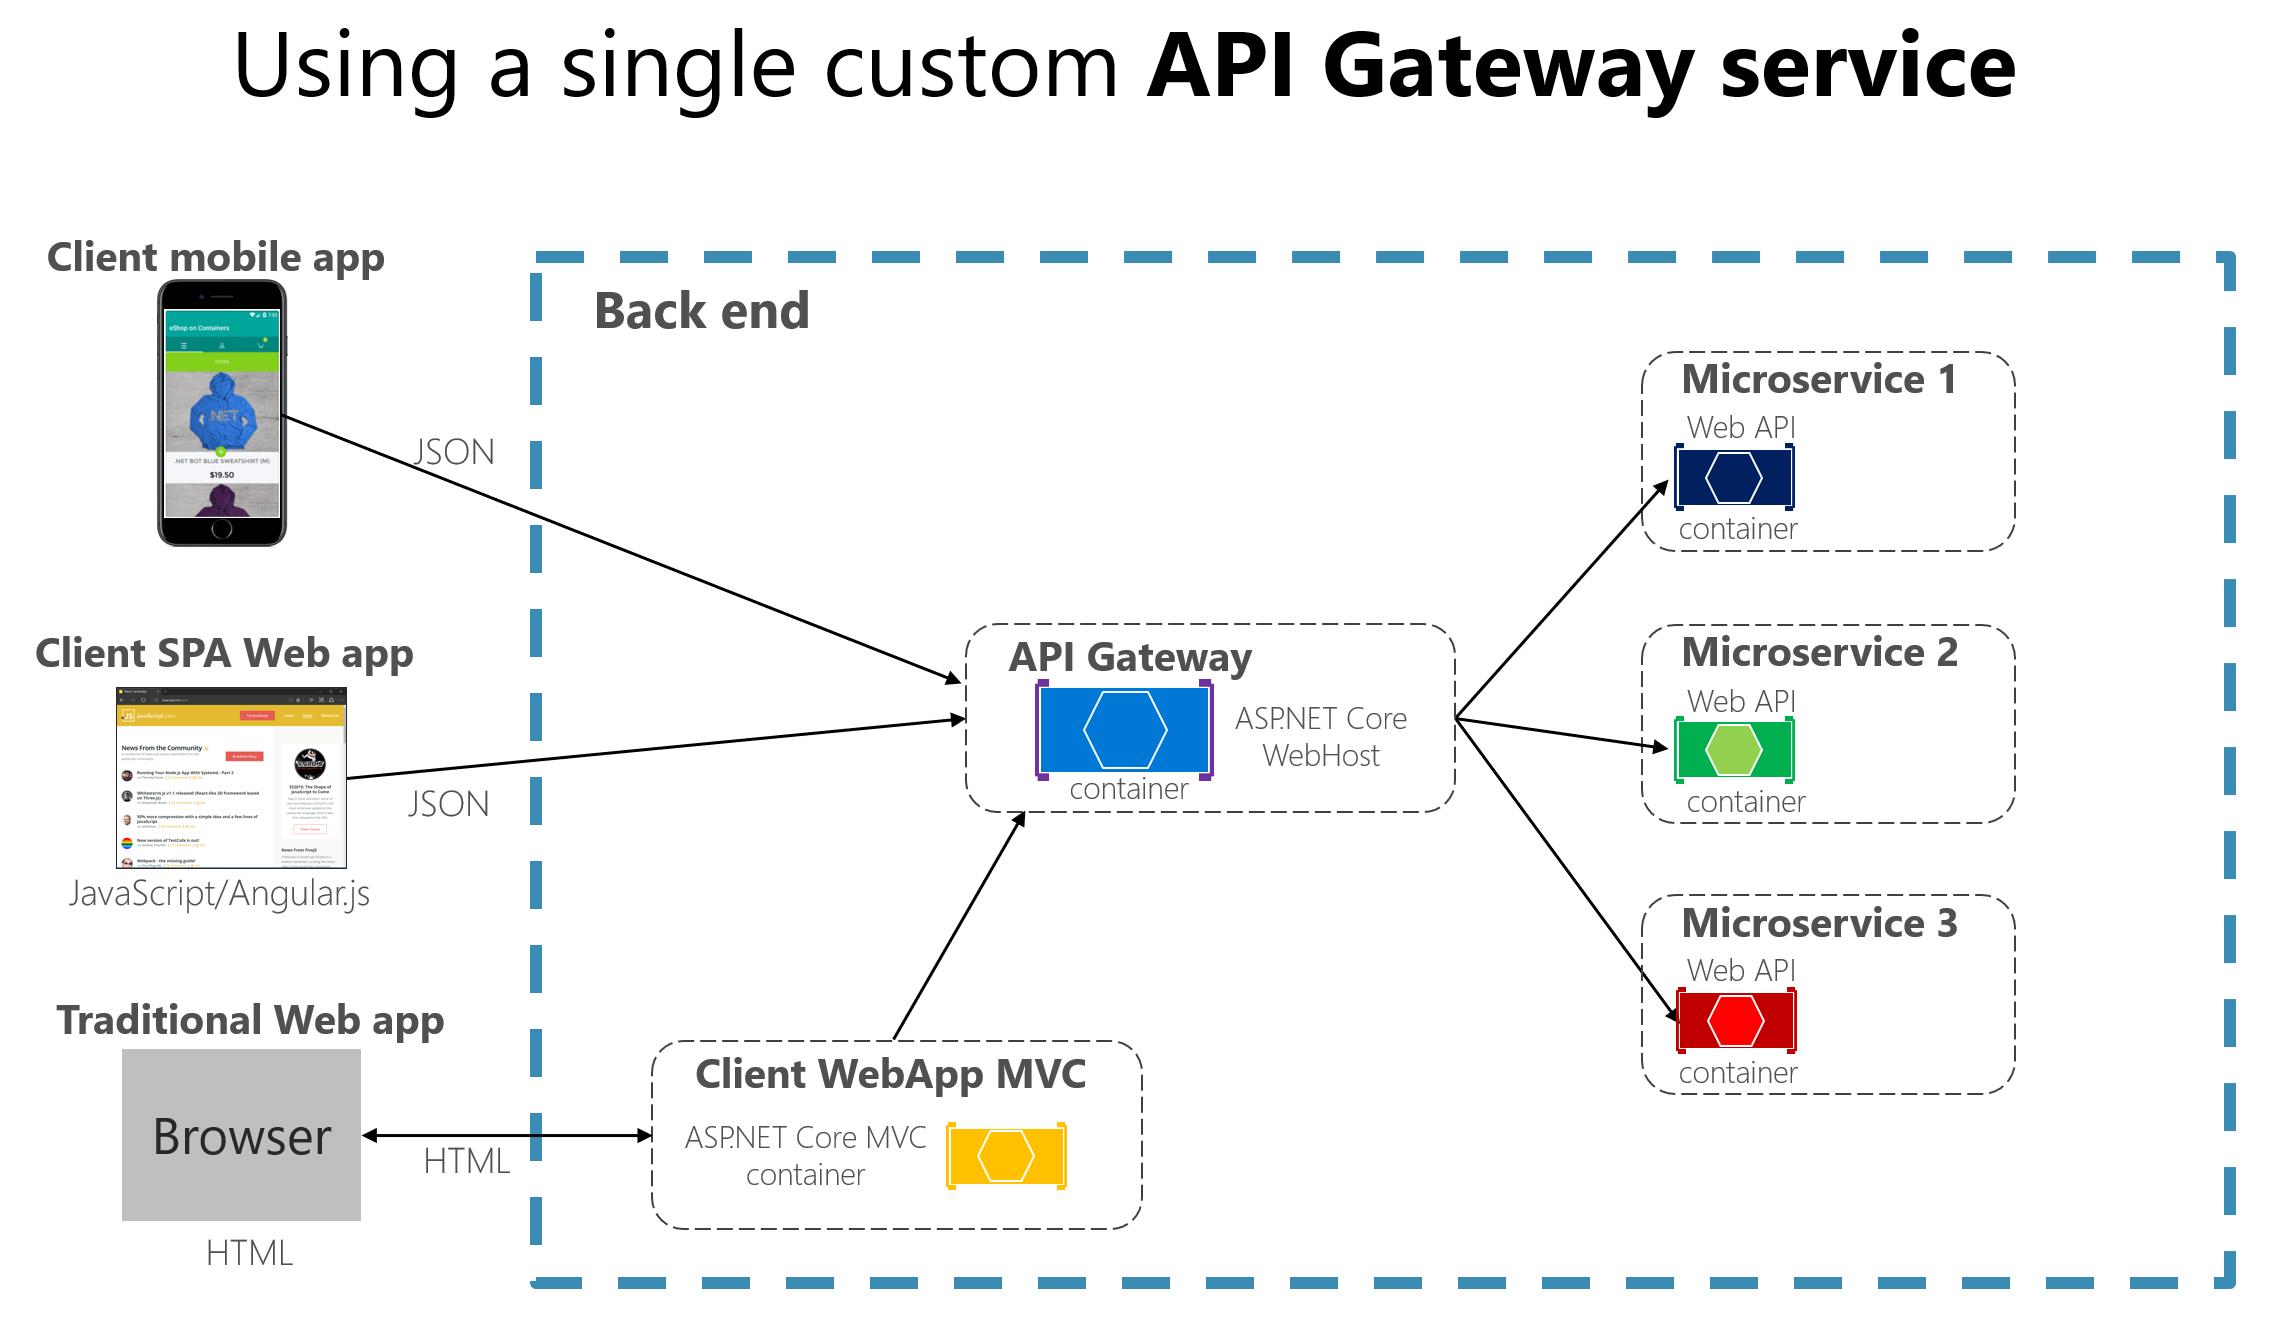 https://docs.microsoft.com/zh-tw/dotnet/standard/microservices-architecture/architect-microservice-container-applications/media/image13.png